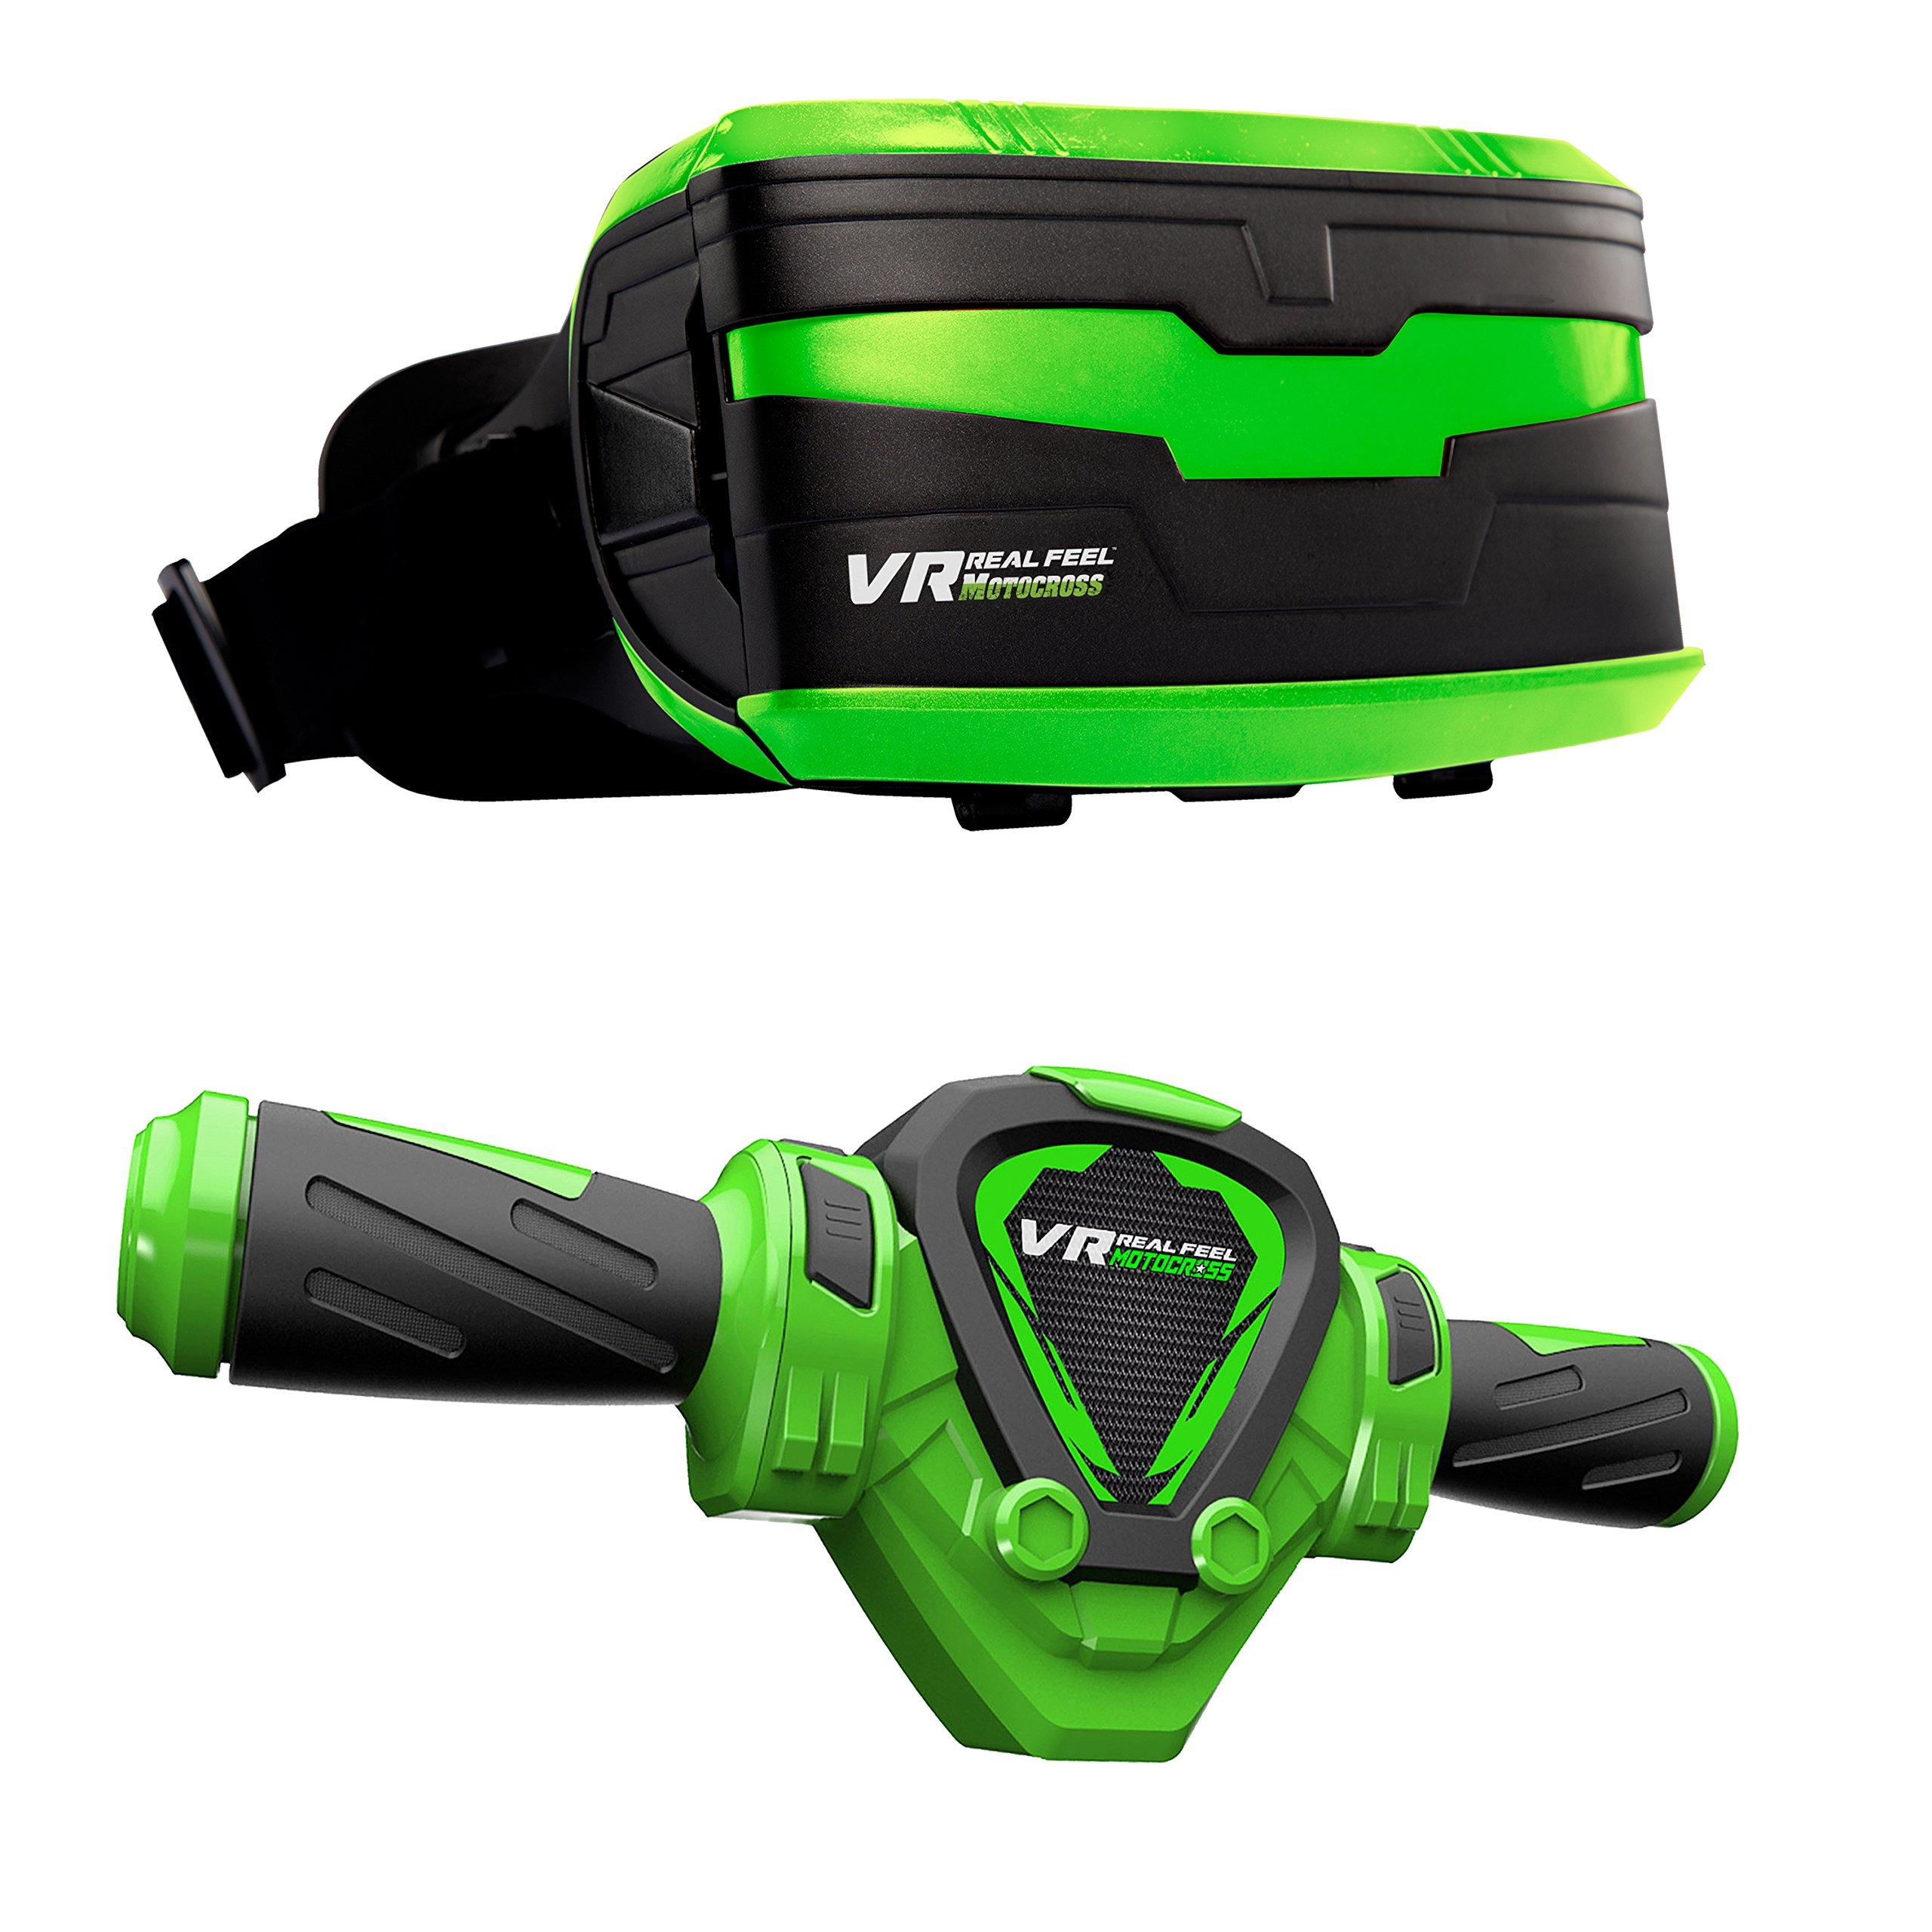 VR Entertainment VR Real Feel Motocross Mobile VR Gaming by VR Entertainment